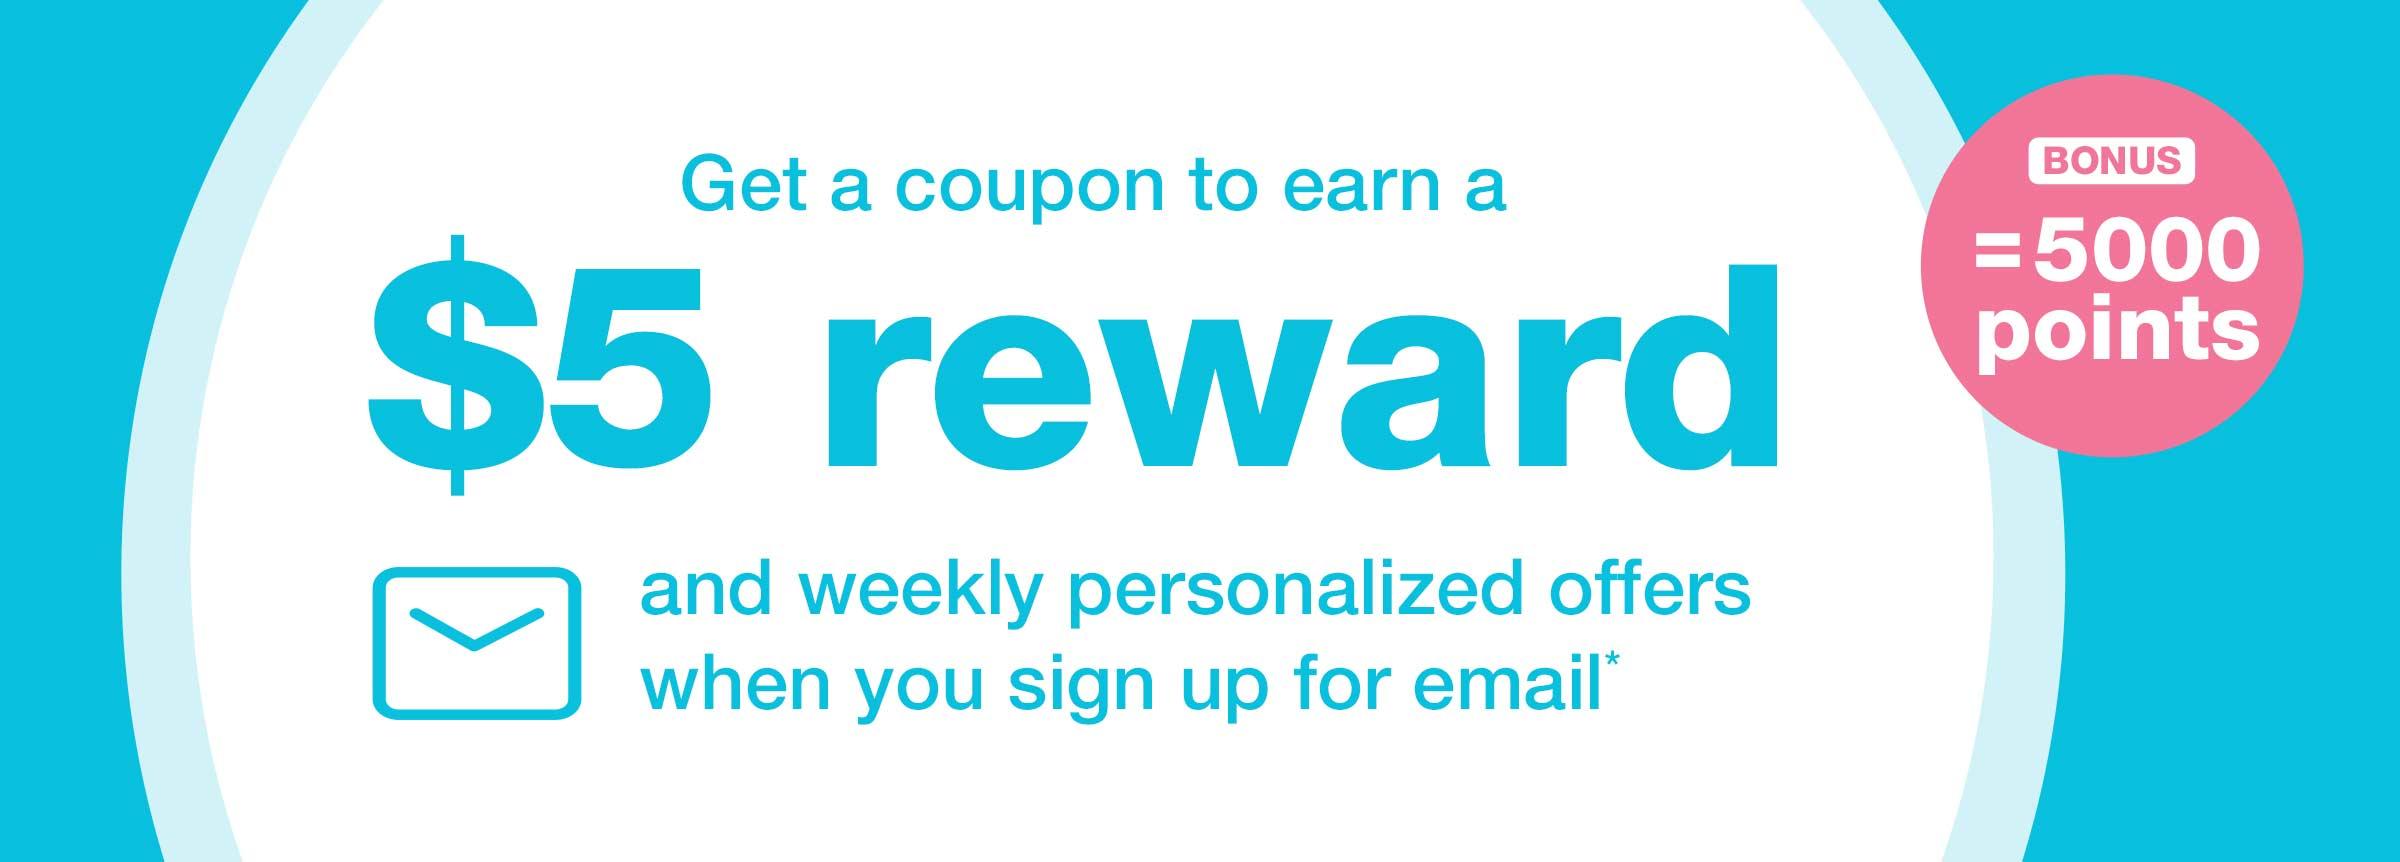 Walgreens Balance Rewards Members: $5 Reward w/ email sign-up